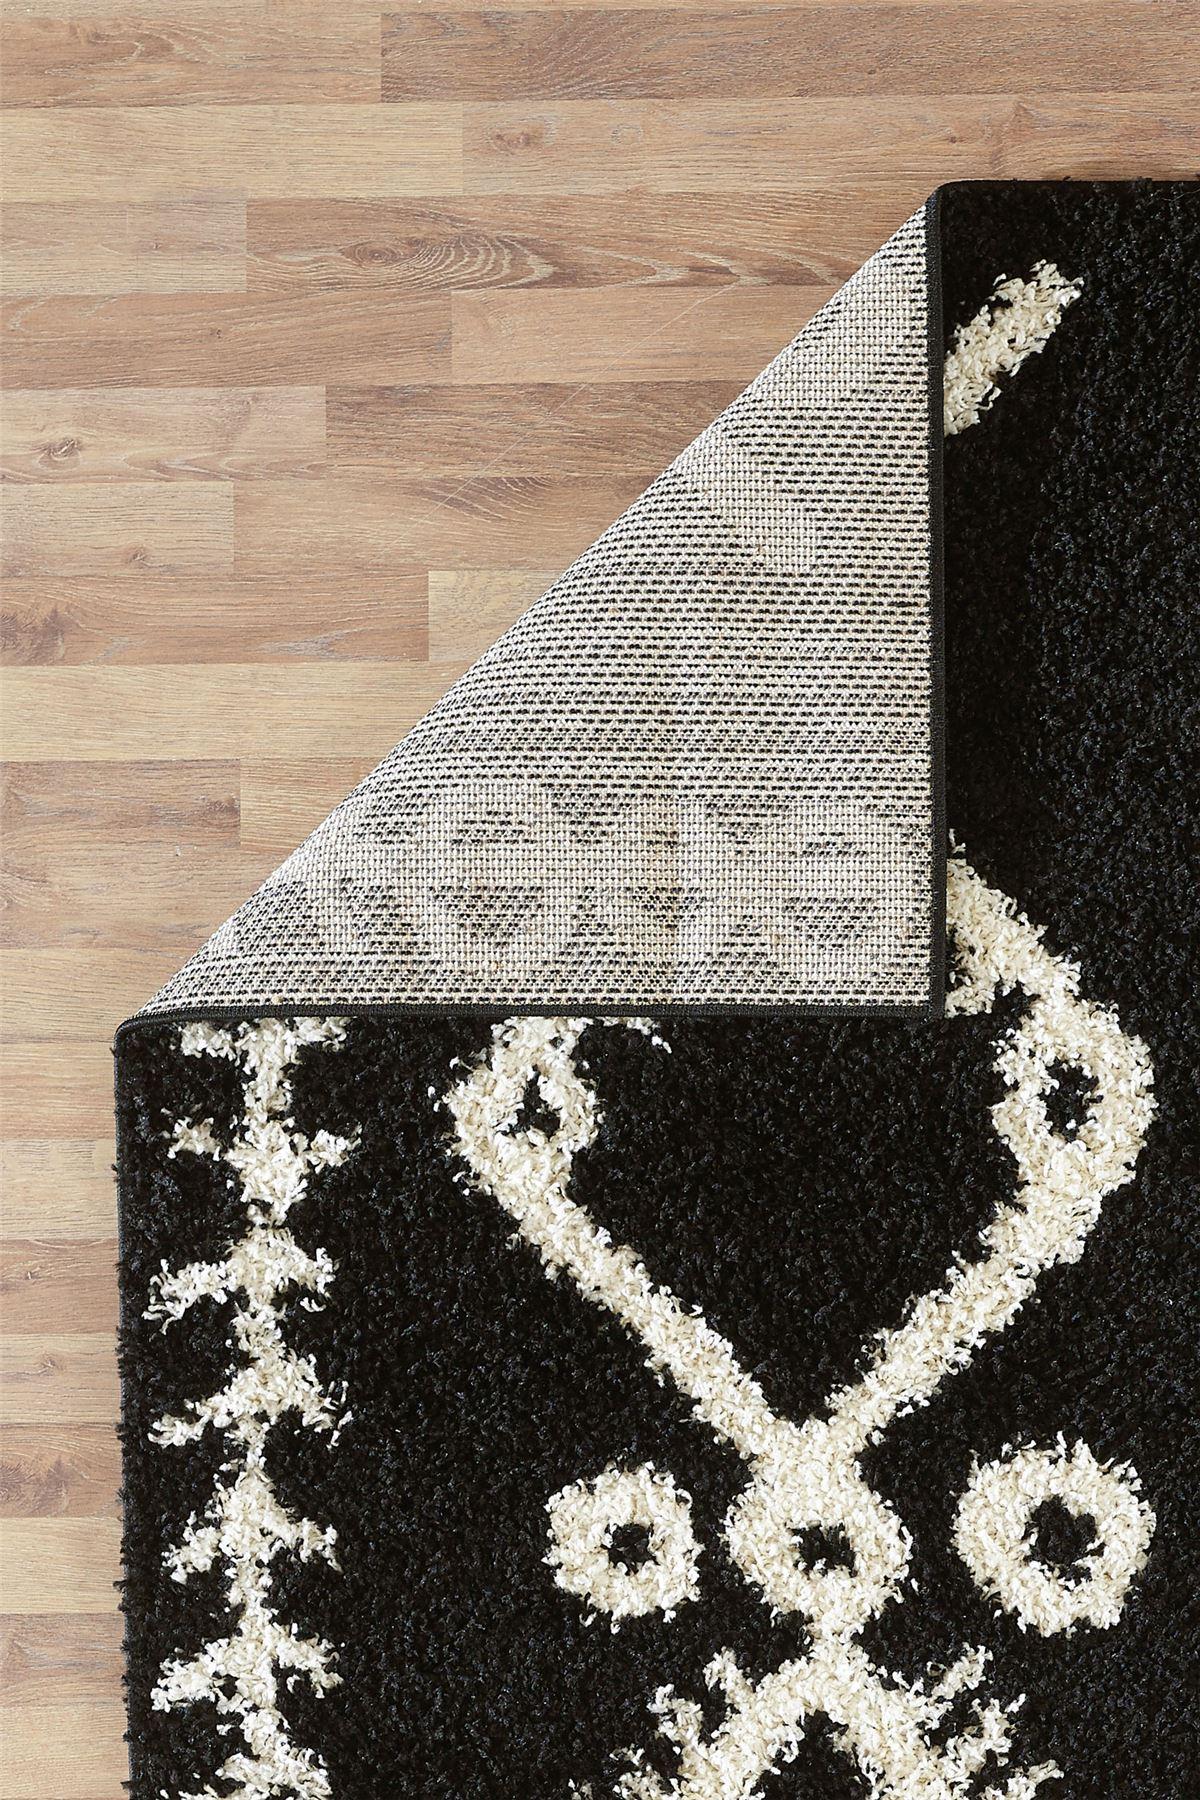 Moroccan-Shaggy-Area-Rug-Grey-White-Black-Soft-Carpet-Traditional-Berber-Designs thumbnail 8